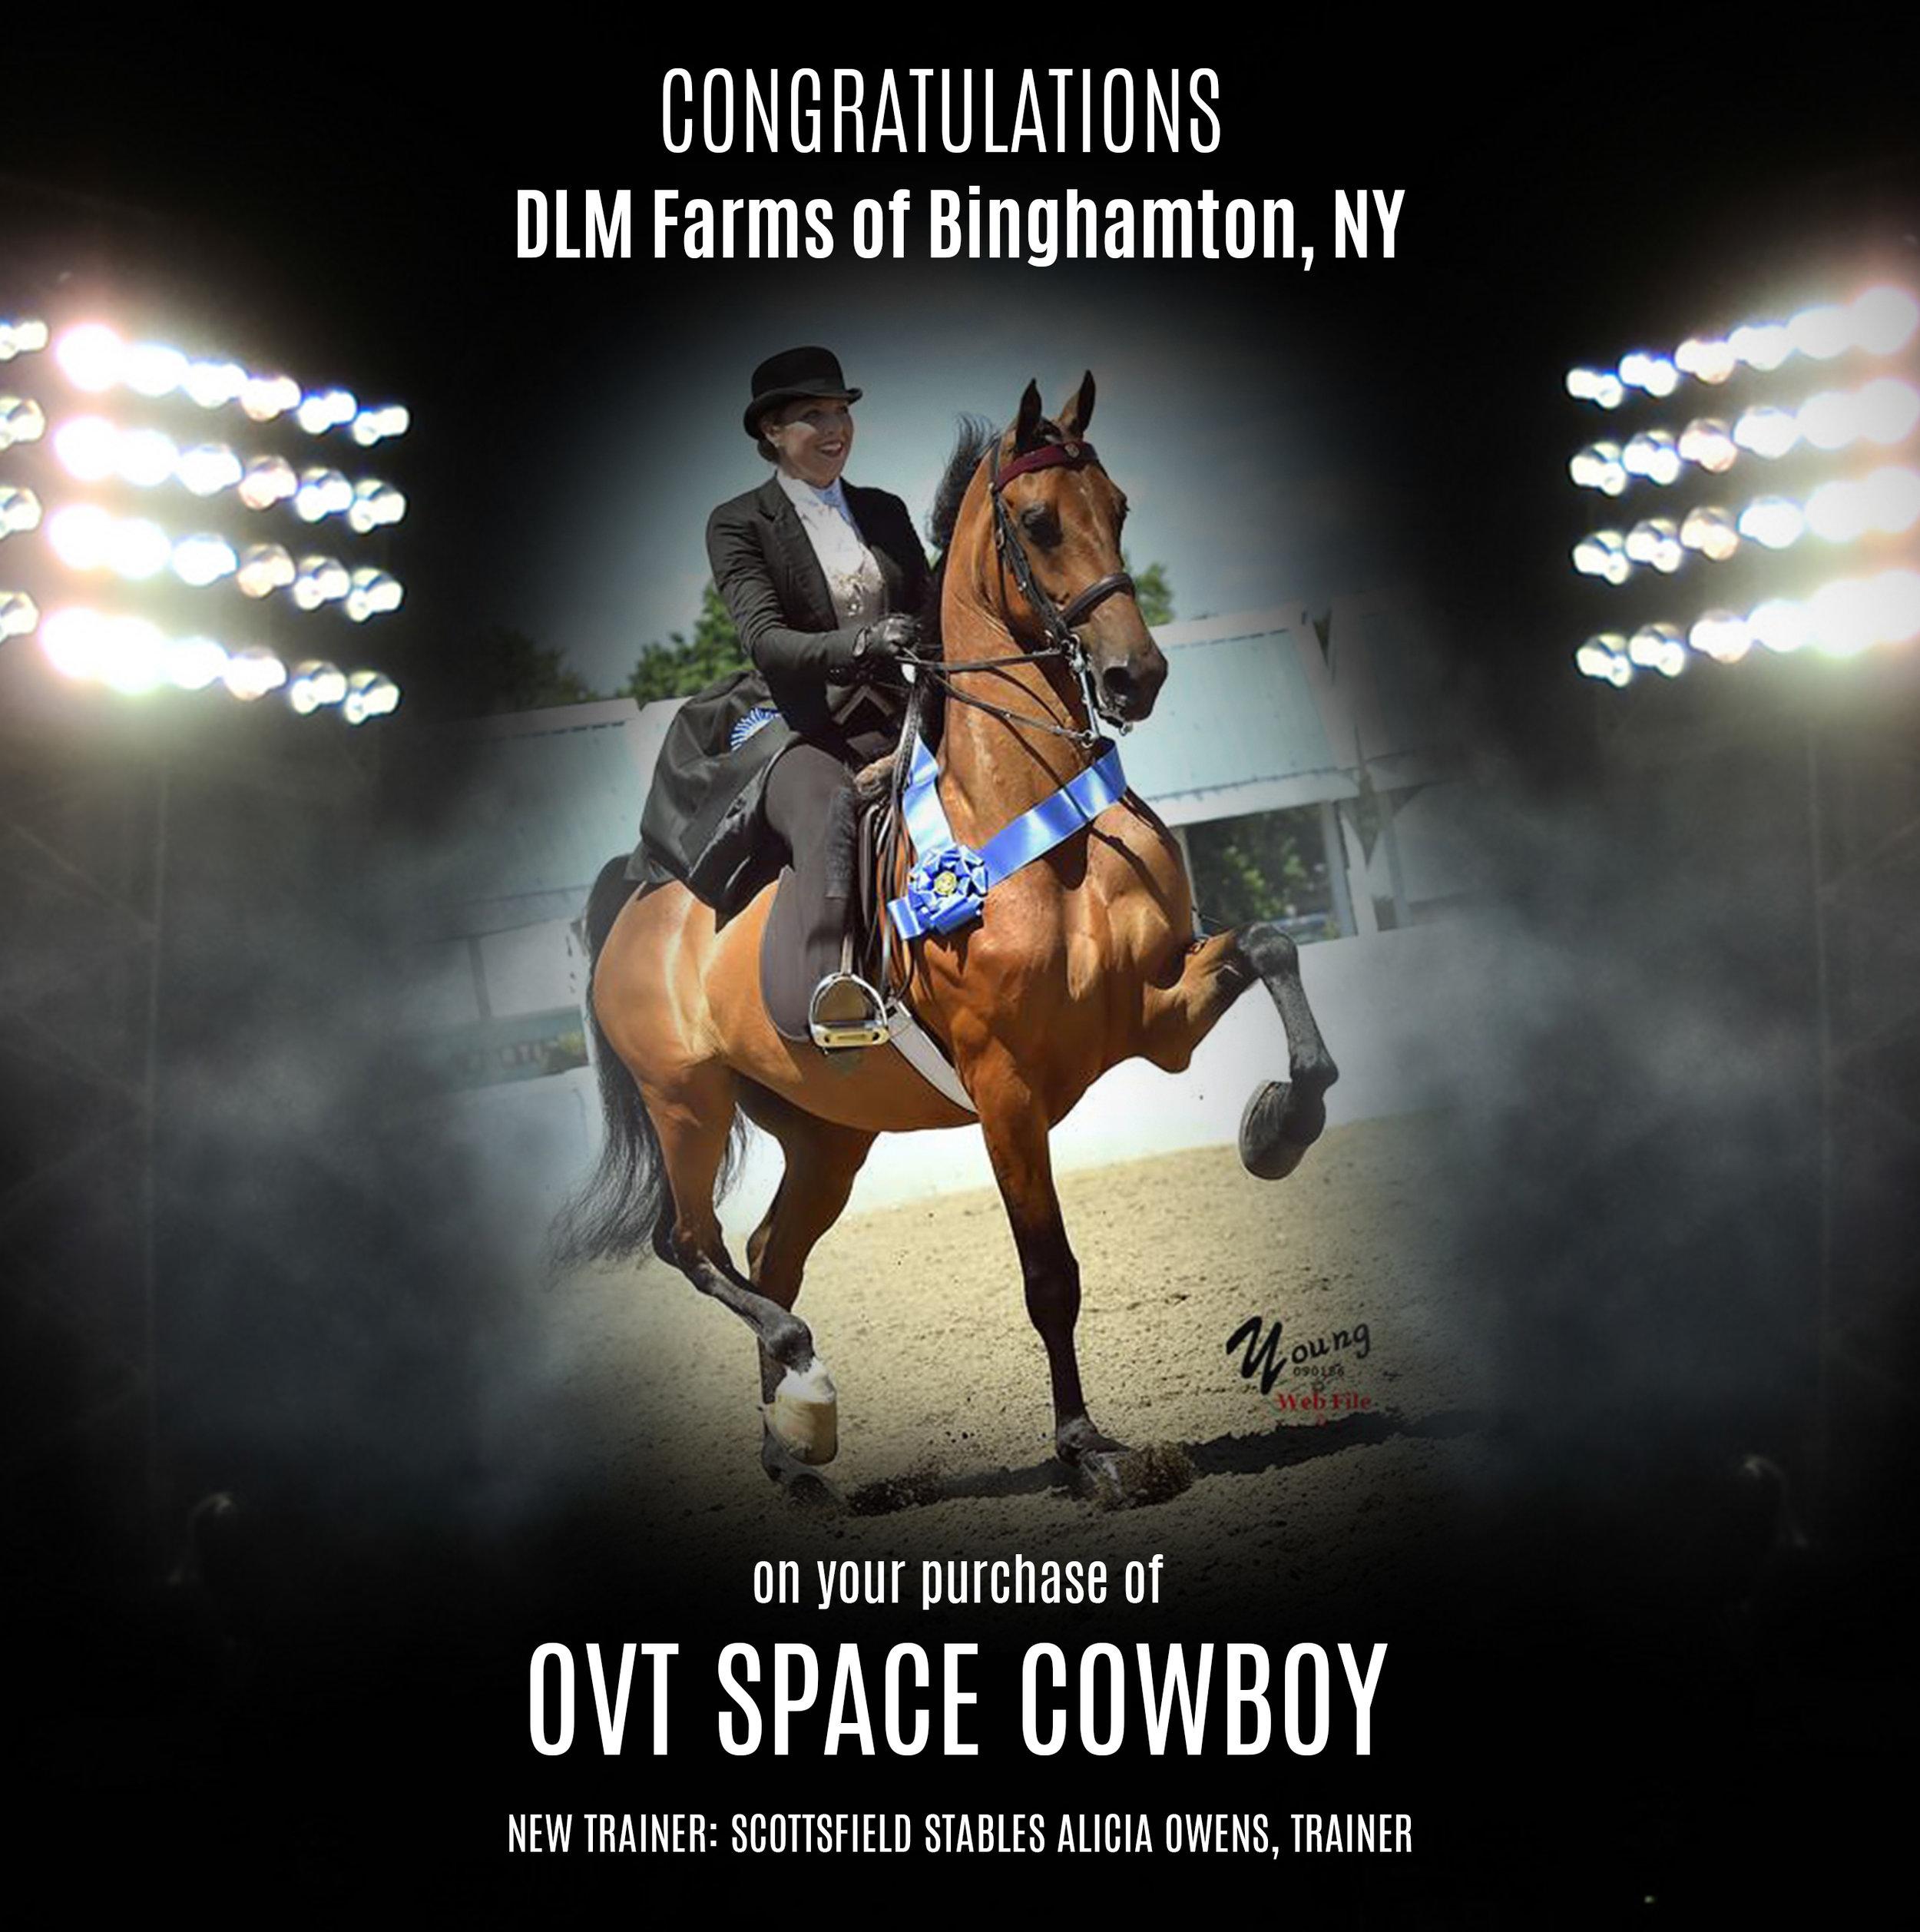 OVT Space Cowboy.jpg